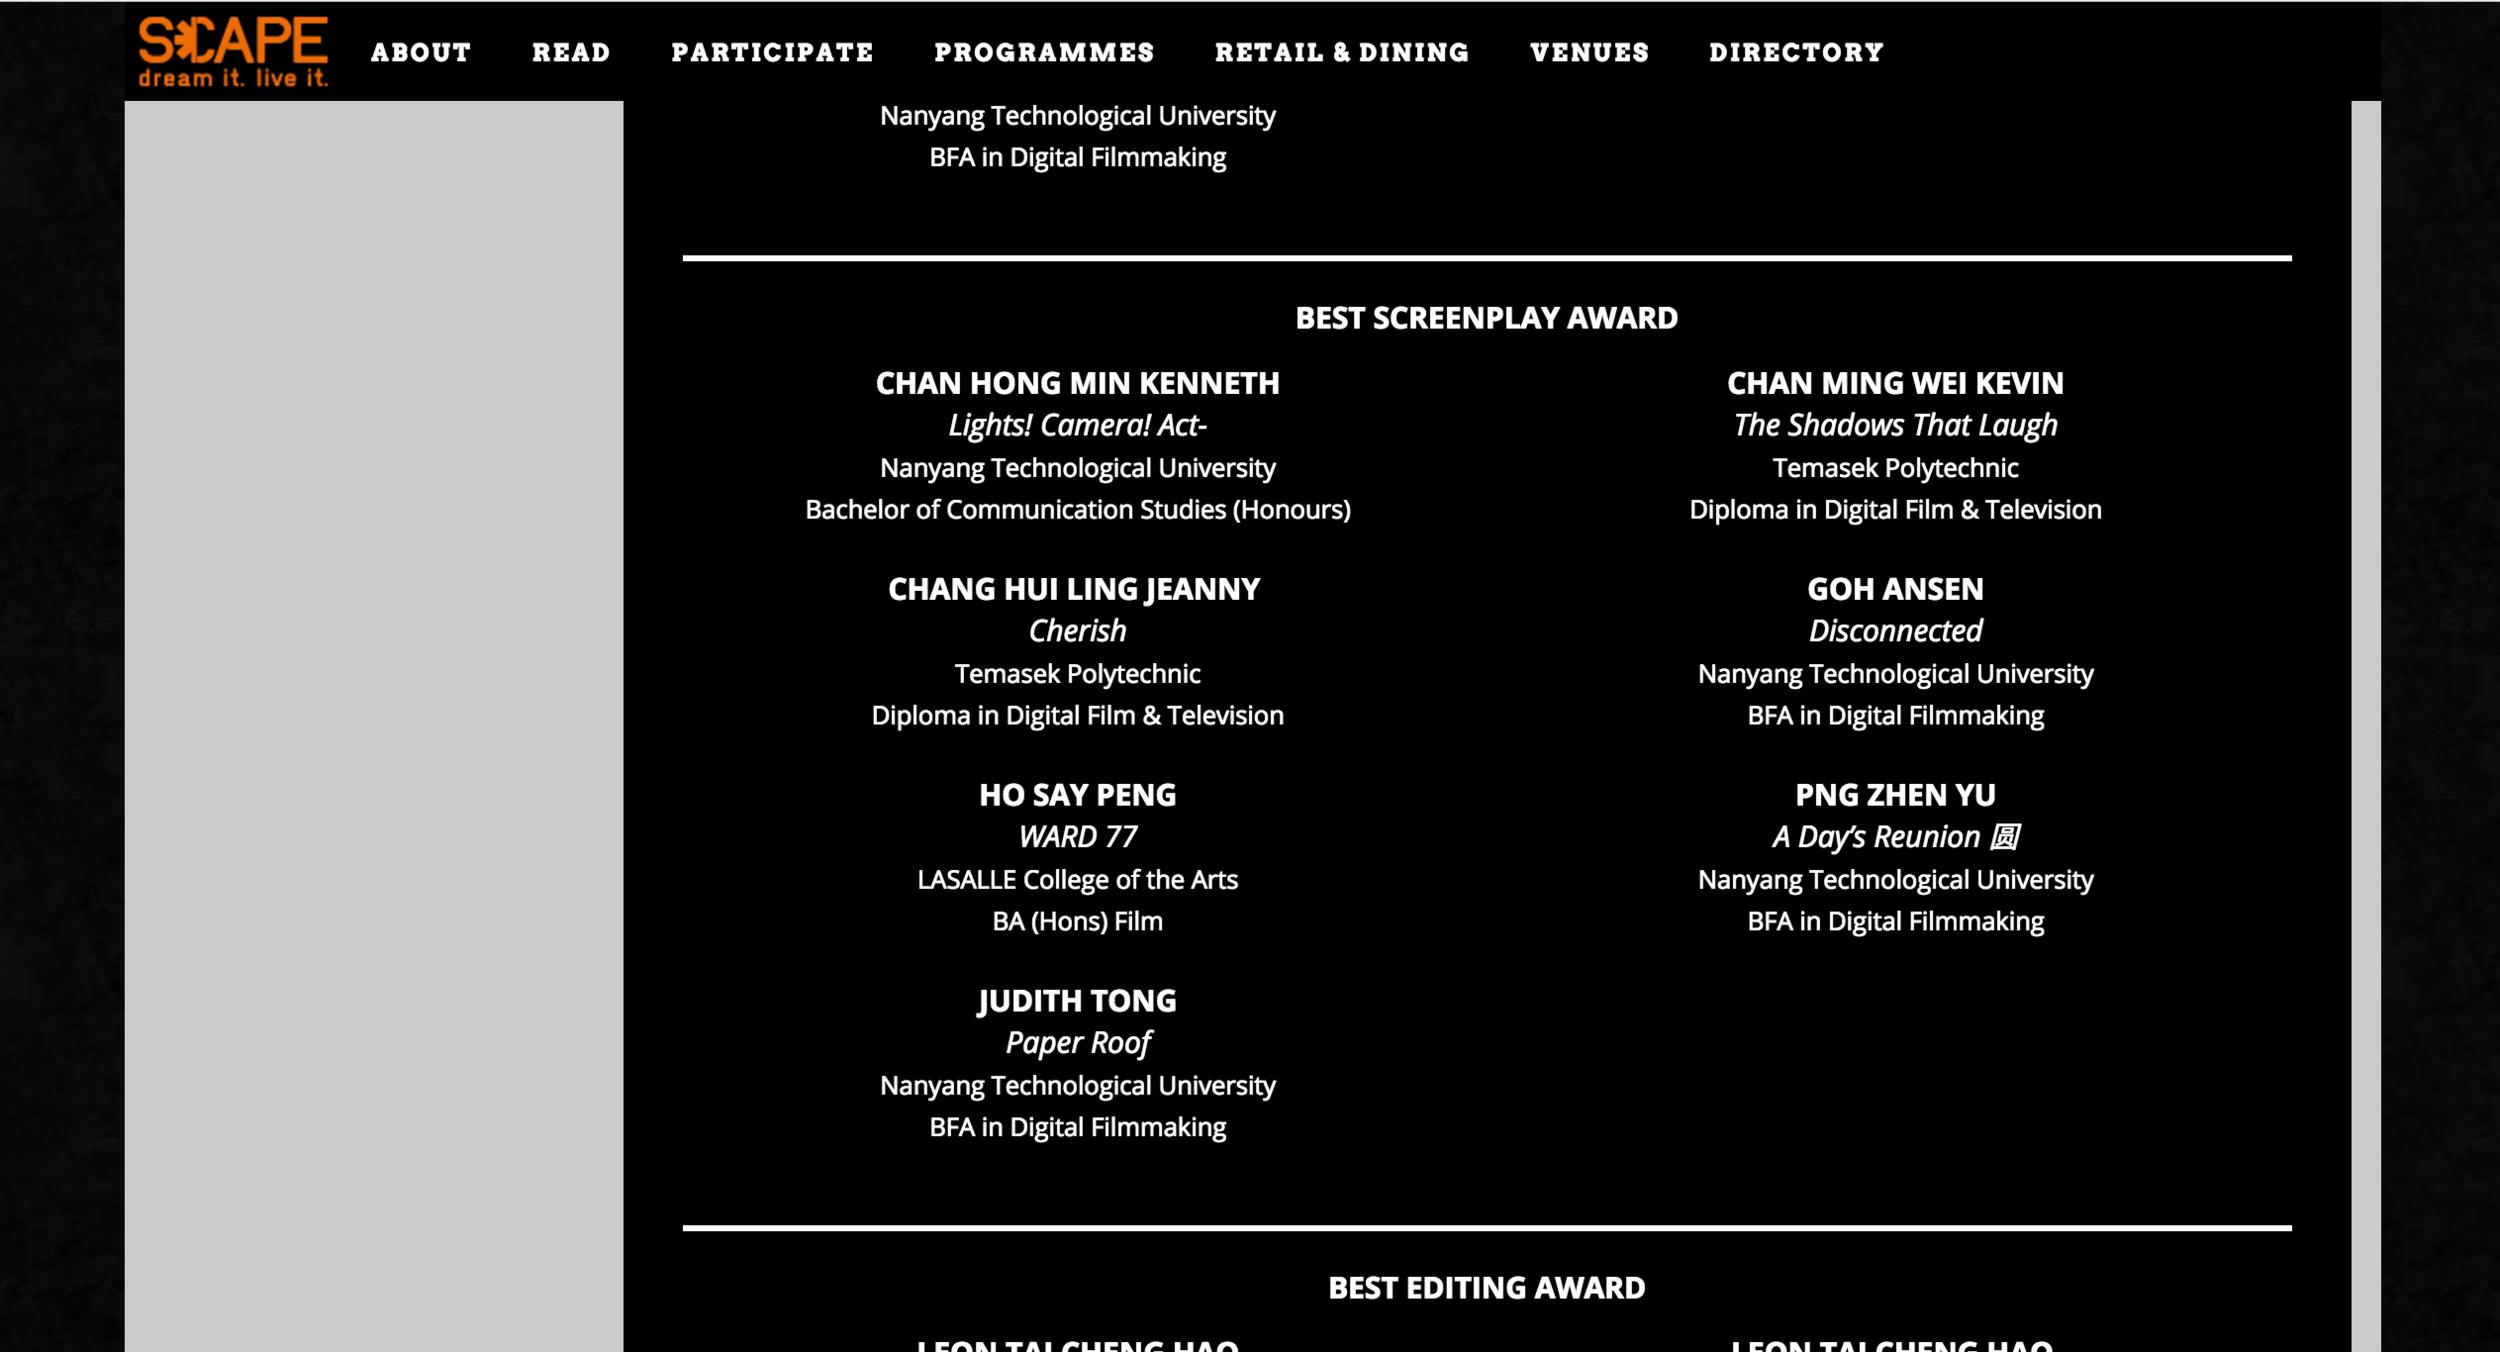 National Youth Film Awards 2017 Nomination